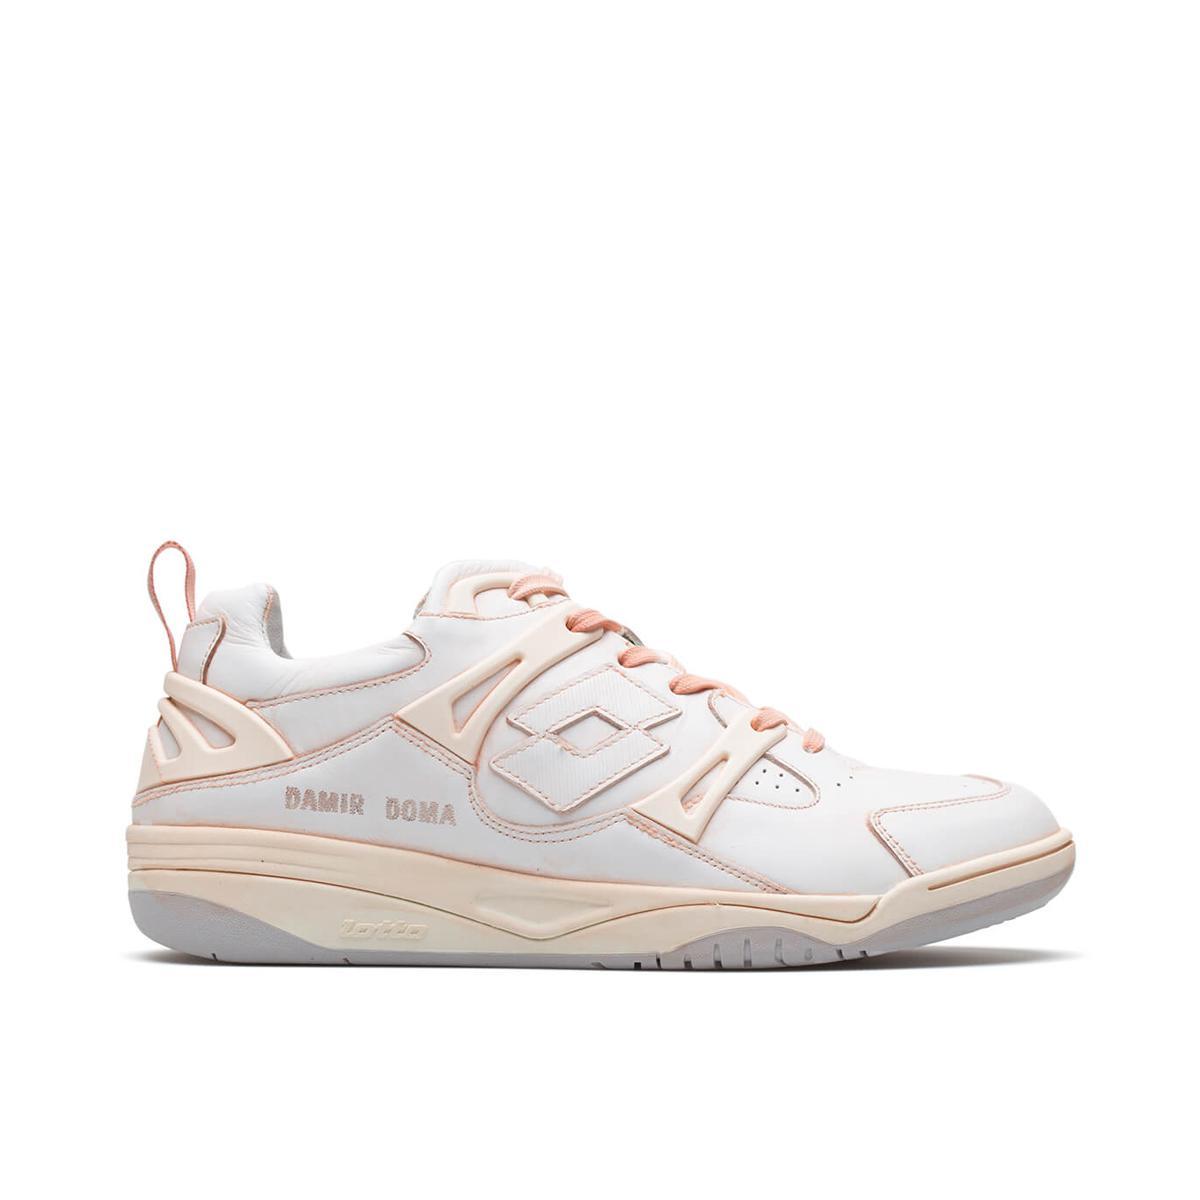 finest selection e12ad d28c6 damir-doma-White-Flor-Sneakers.jpeg